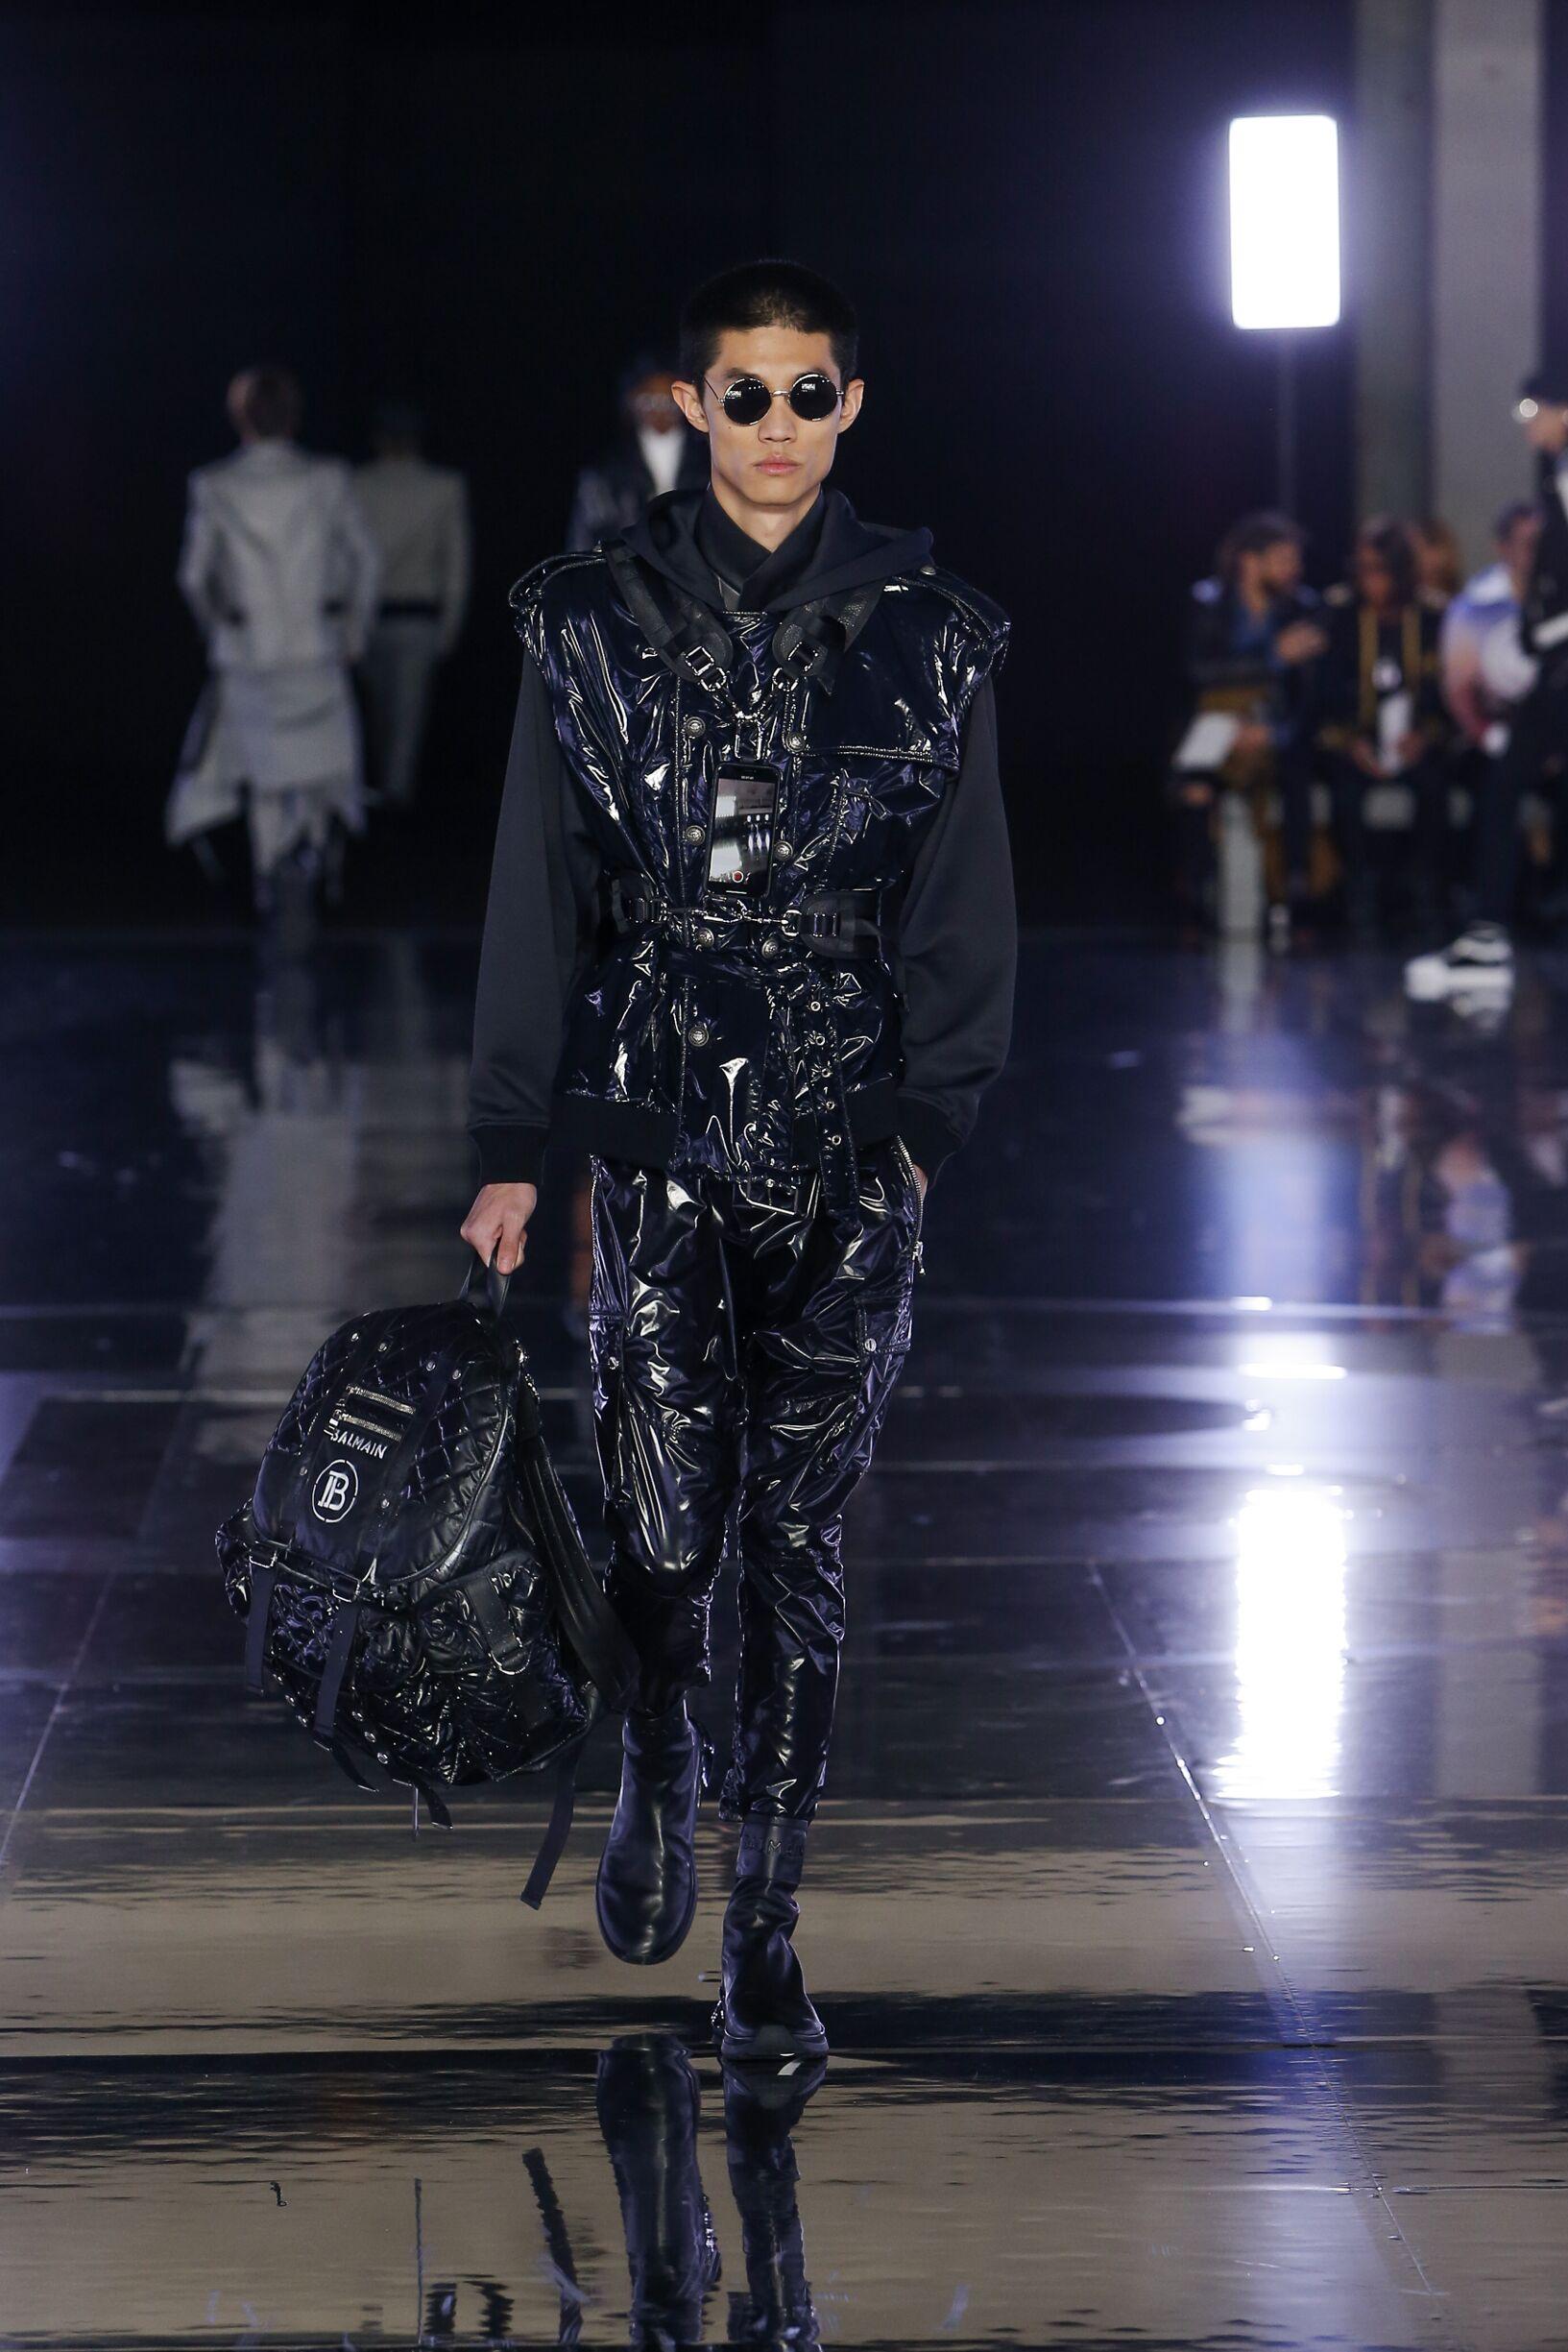 Man FW 2019 Balmain Show Paris Fashion Week